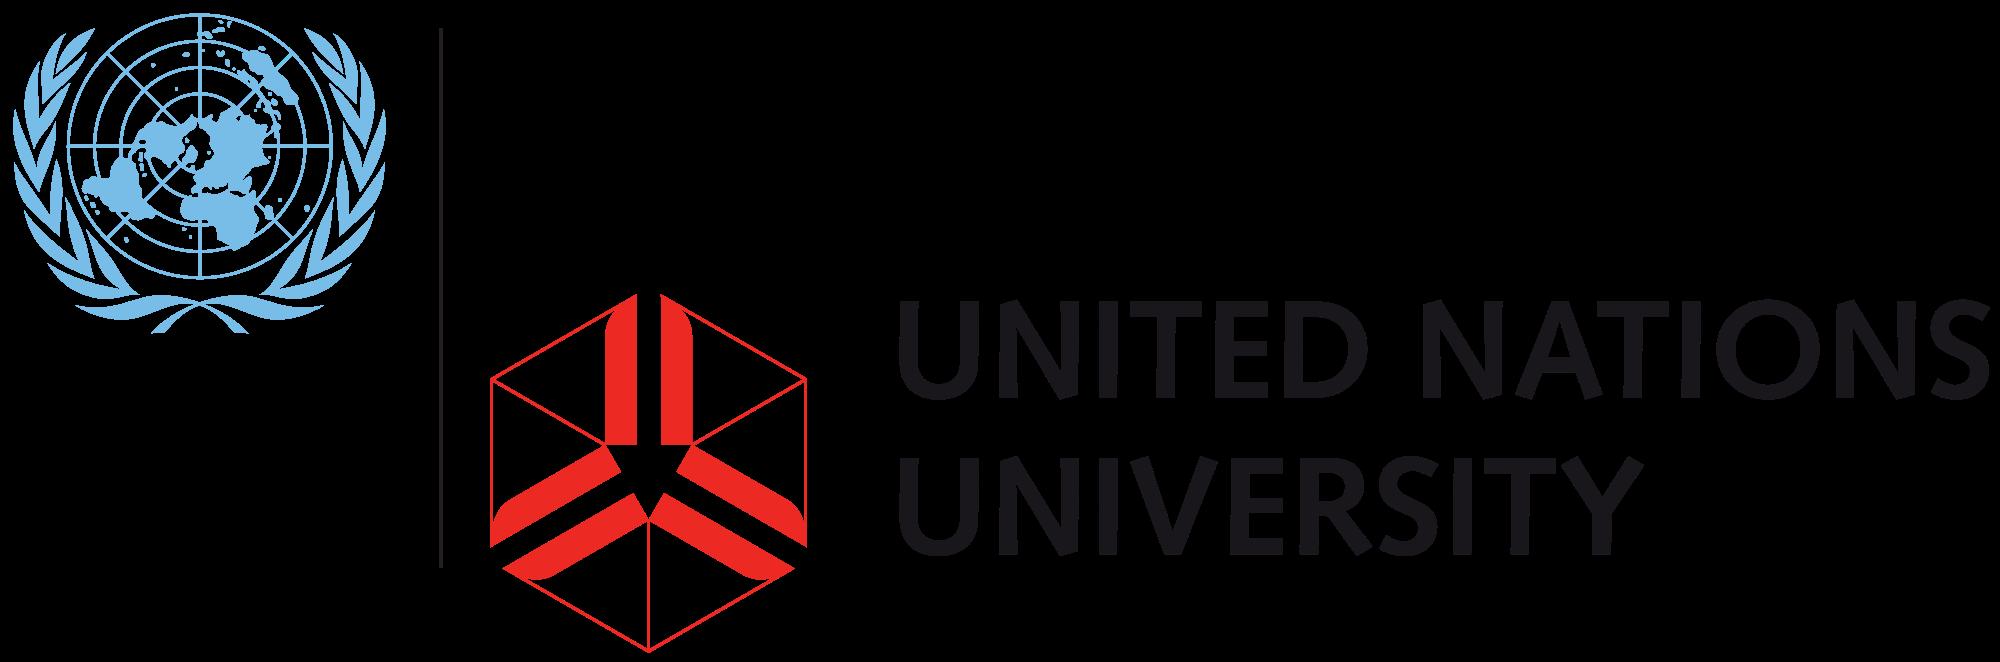 united-nations-university-logo